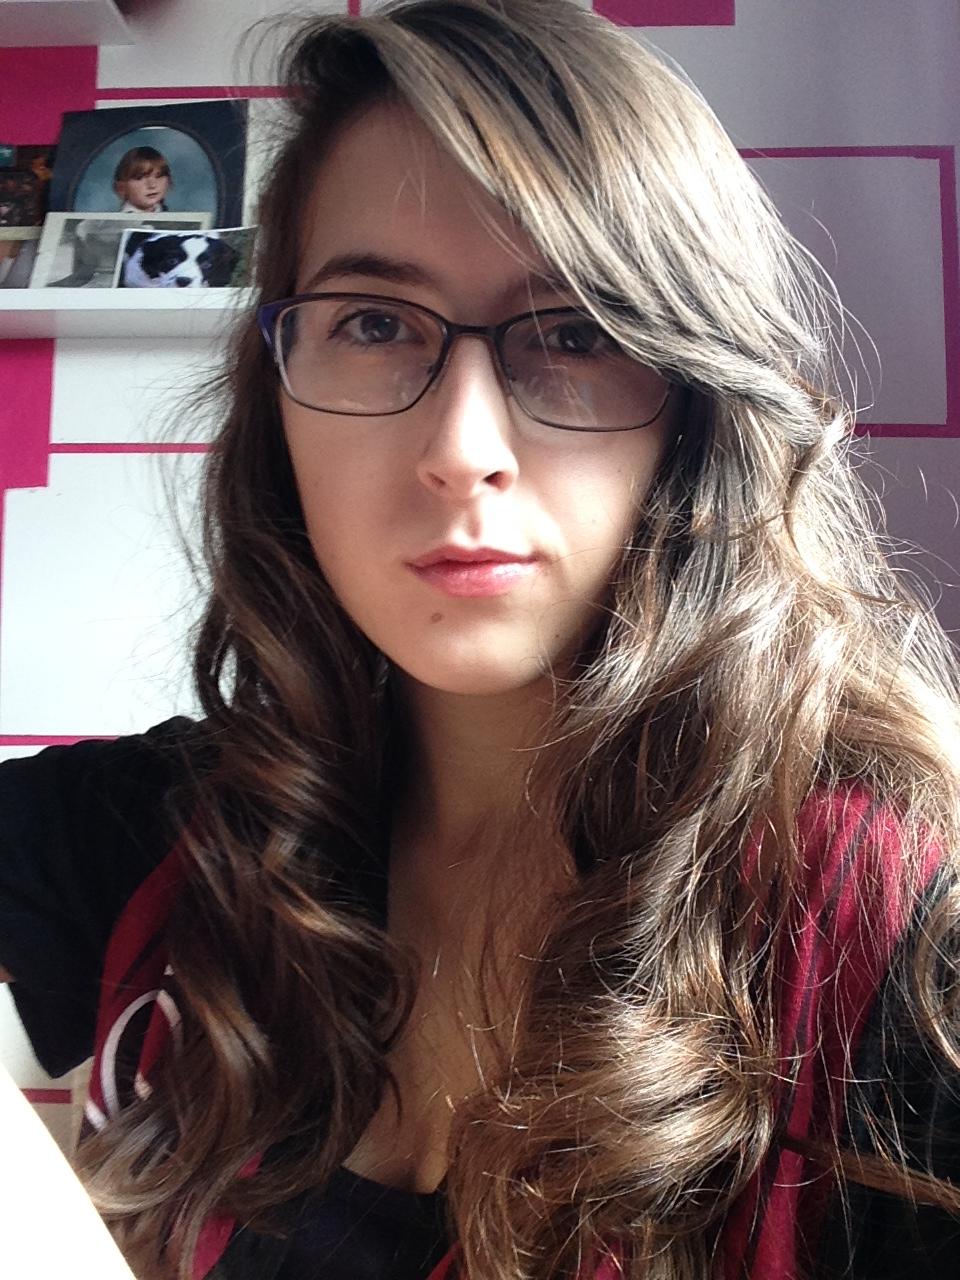 Lauren180's Profile Picture